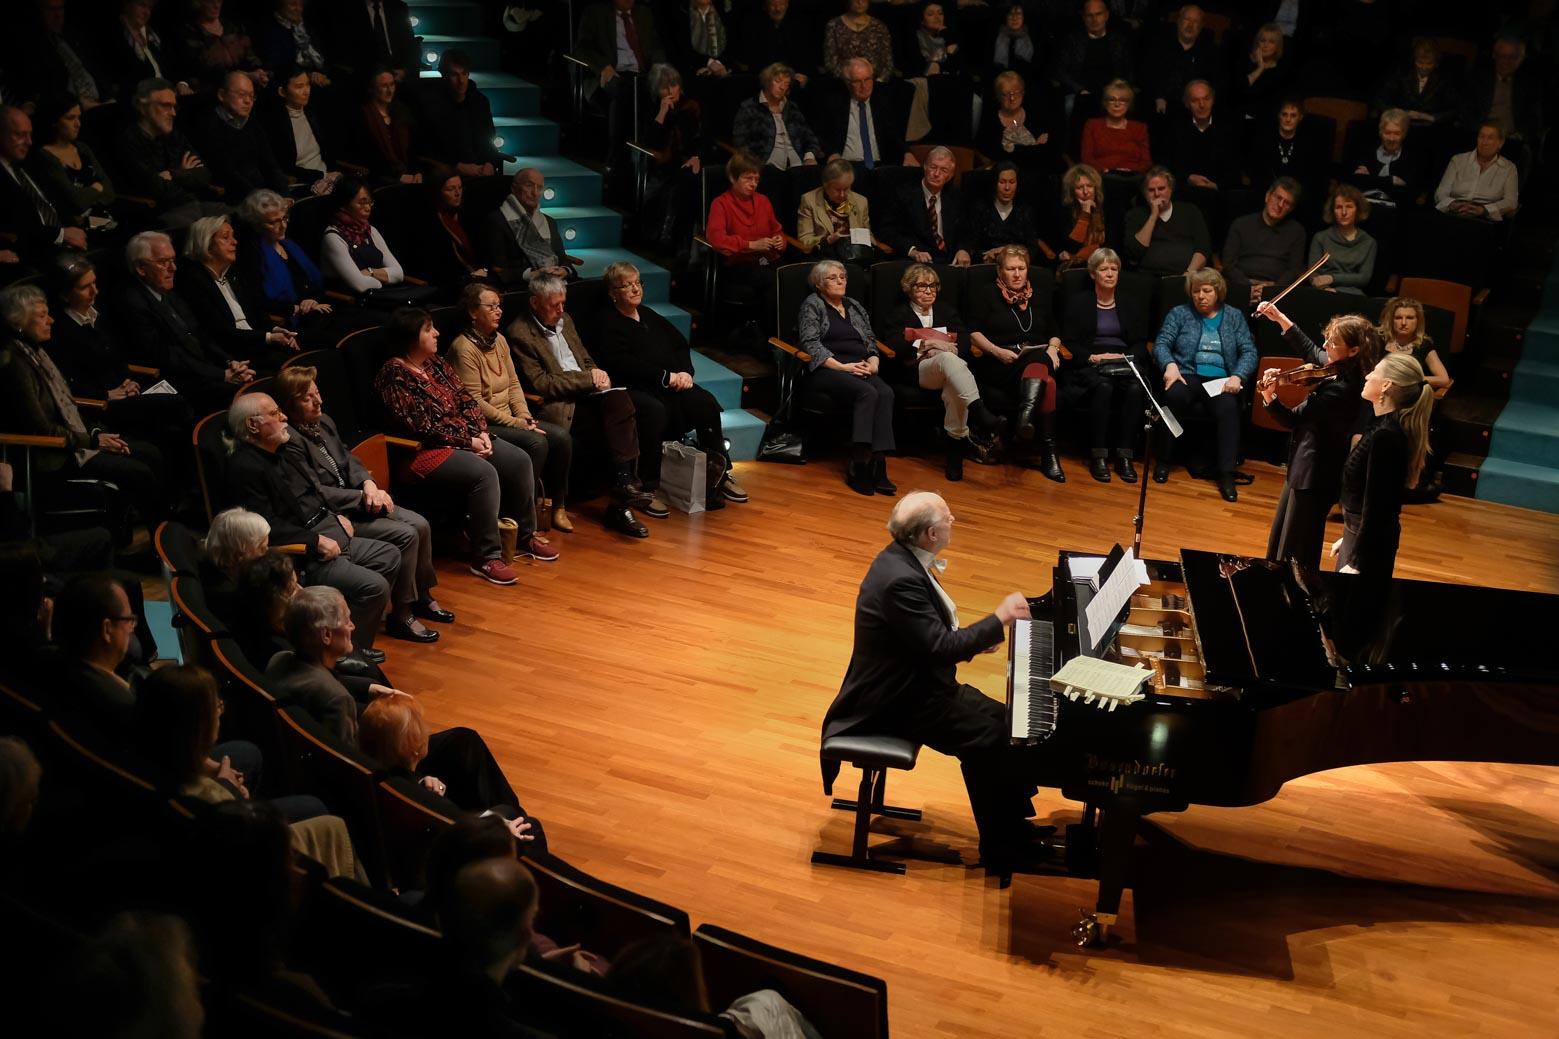 Narropera in Peel, Mozart's Marriage of Figaro as narrated opera @ Centenary Centre